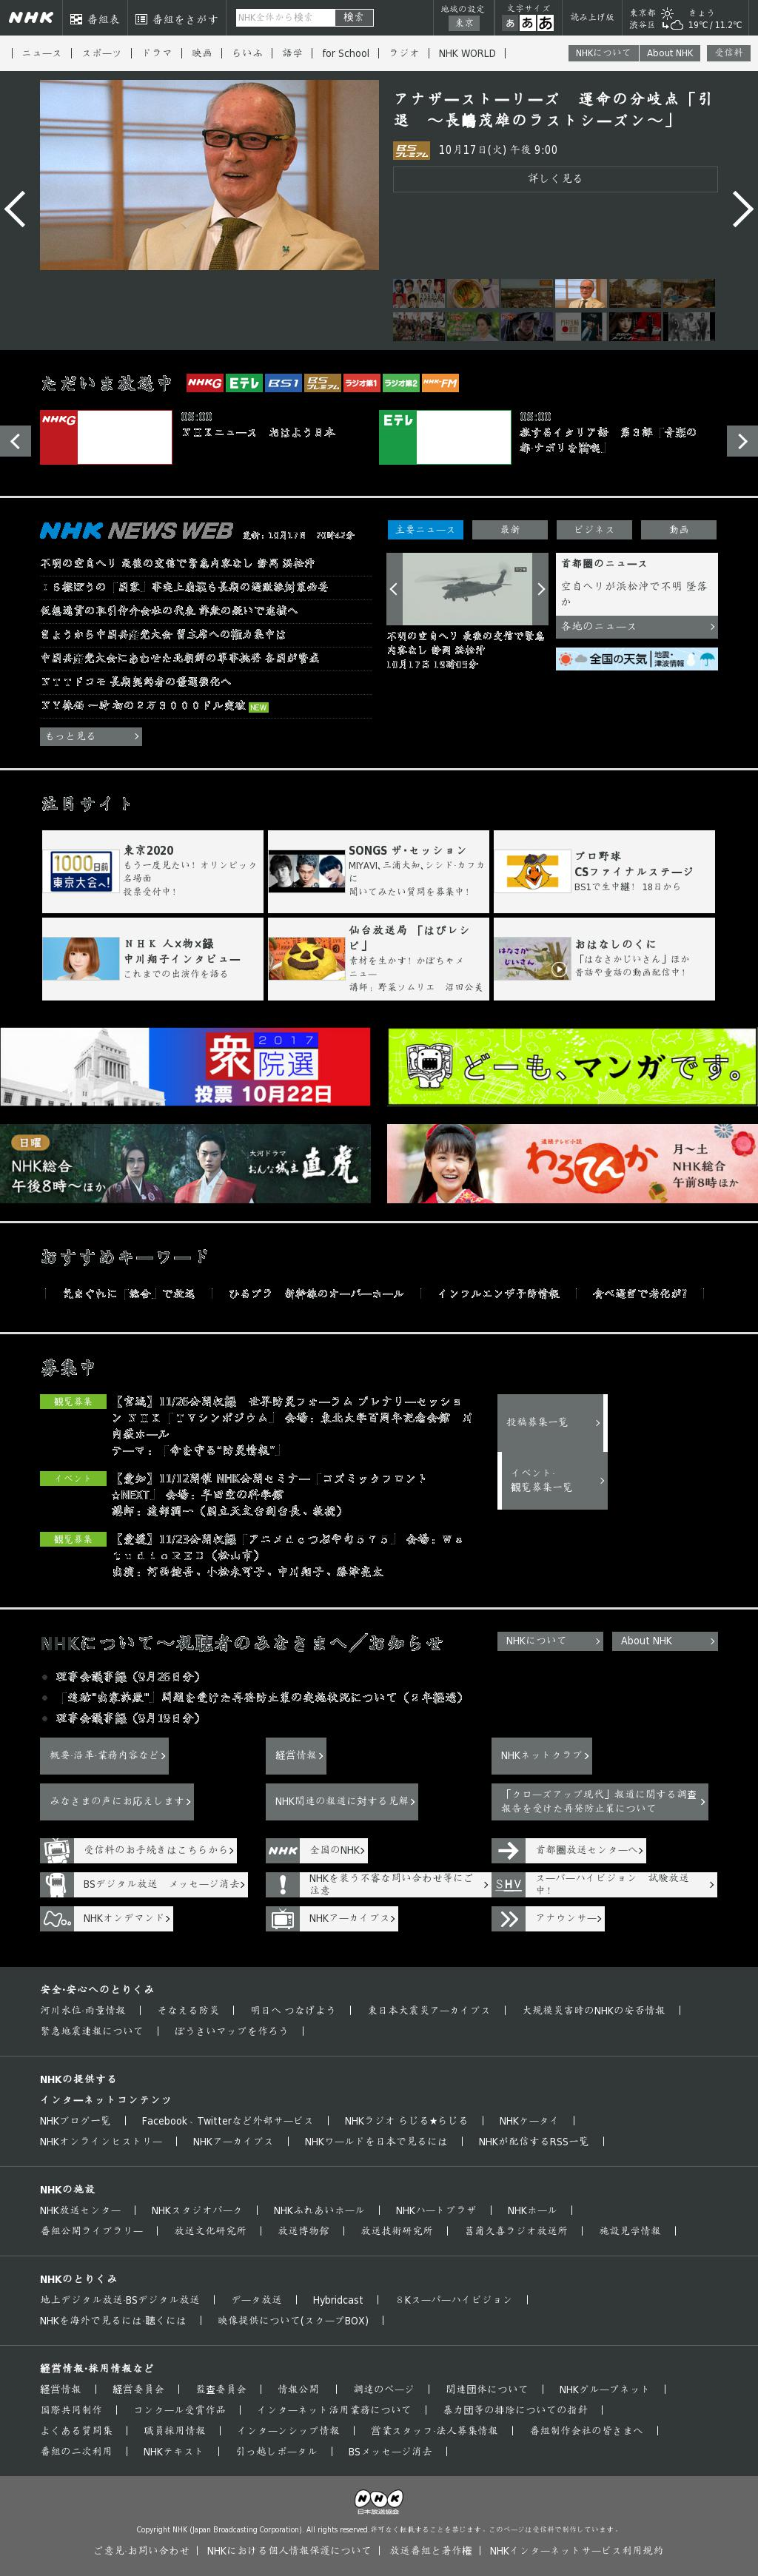 NHK Online at Tuesday Oct. 17, 2017, 9:09 p.m. UTC